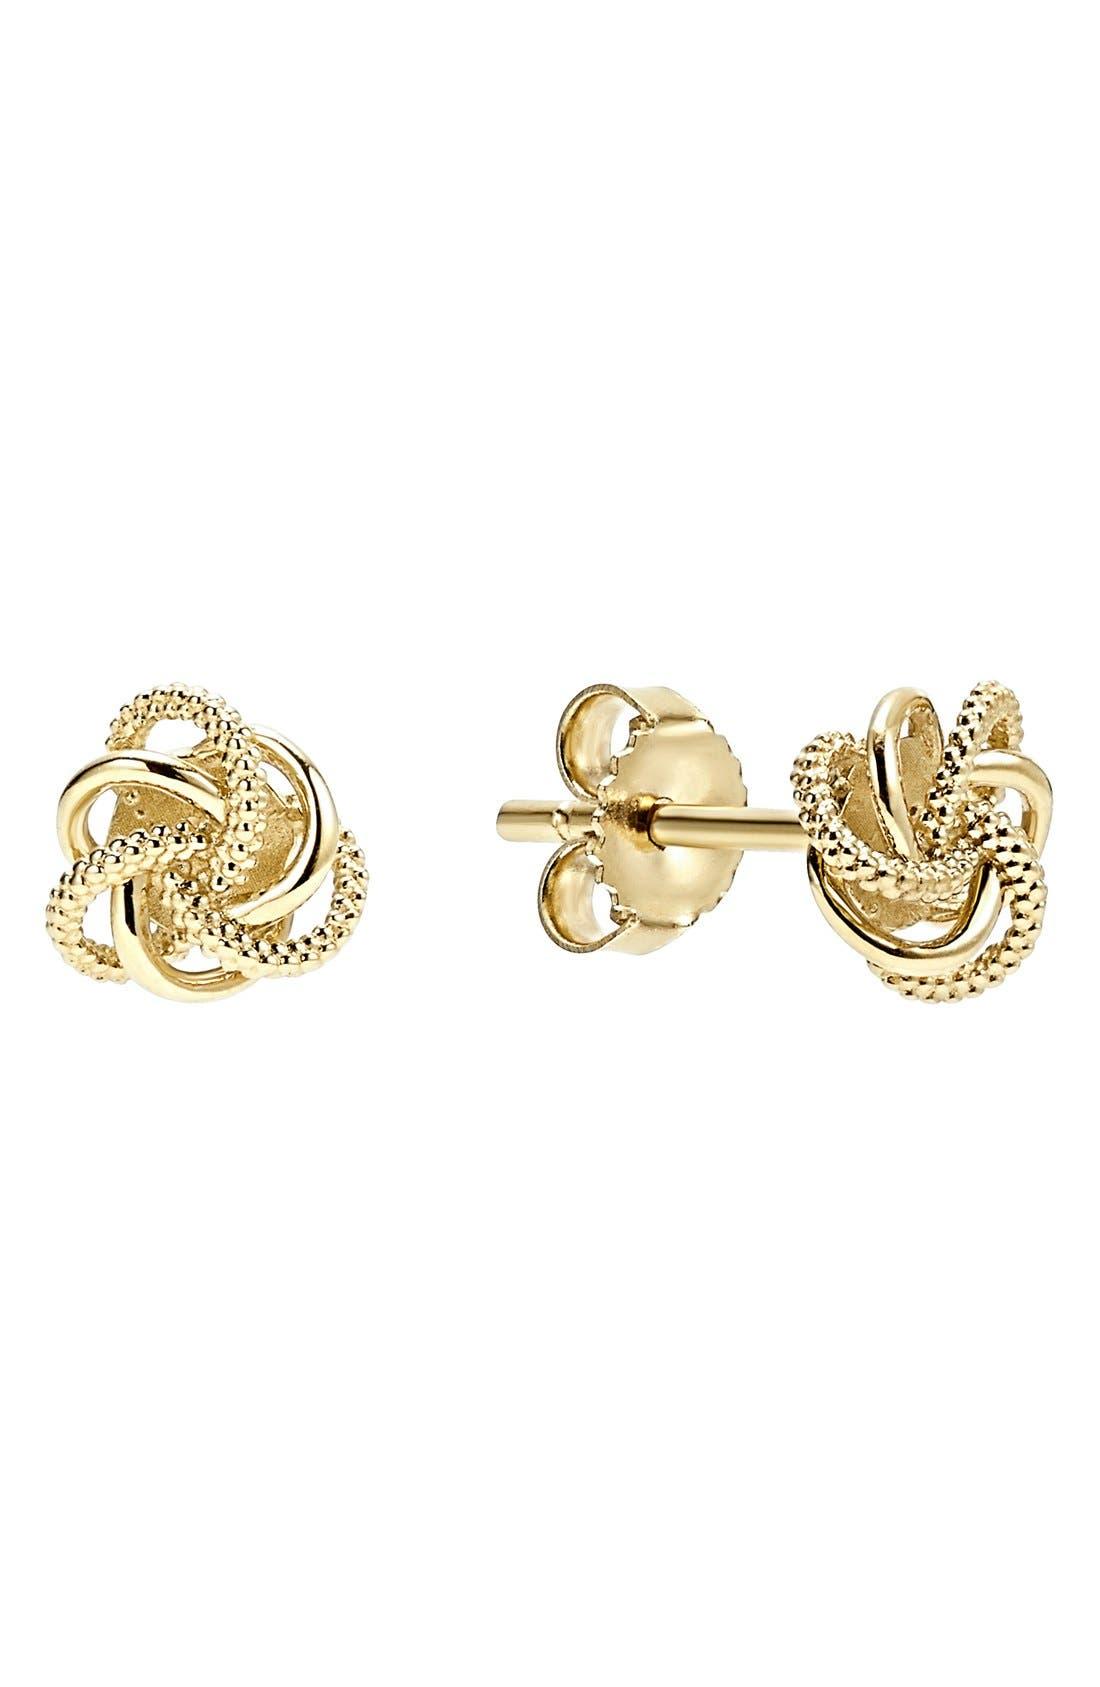 Main Image - Lagos 'Love Knot' Stud Earrings